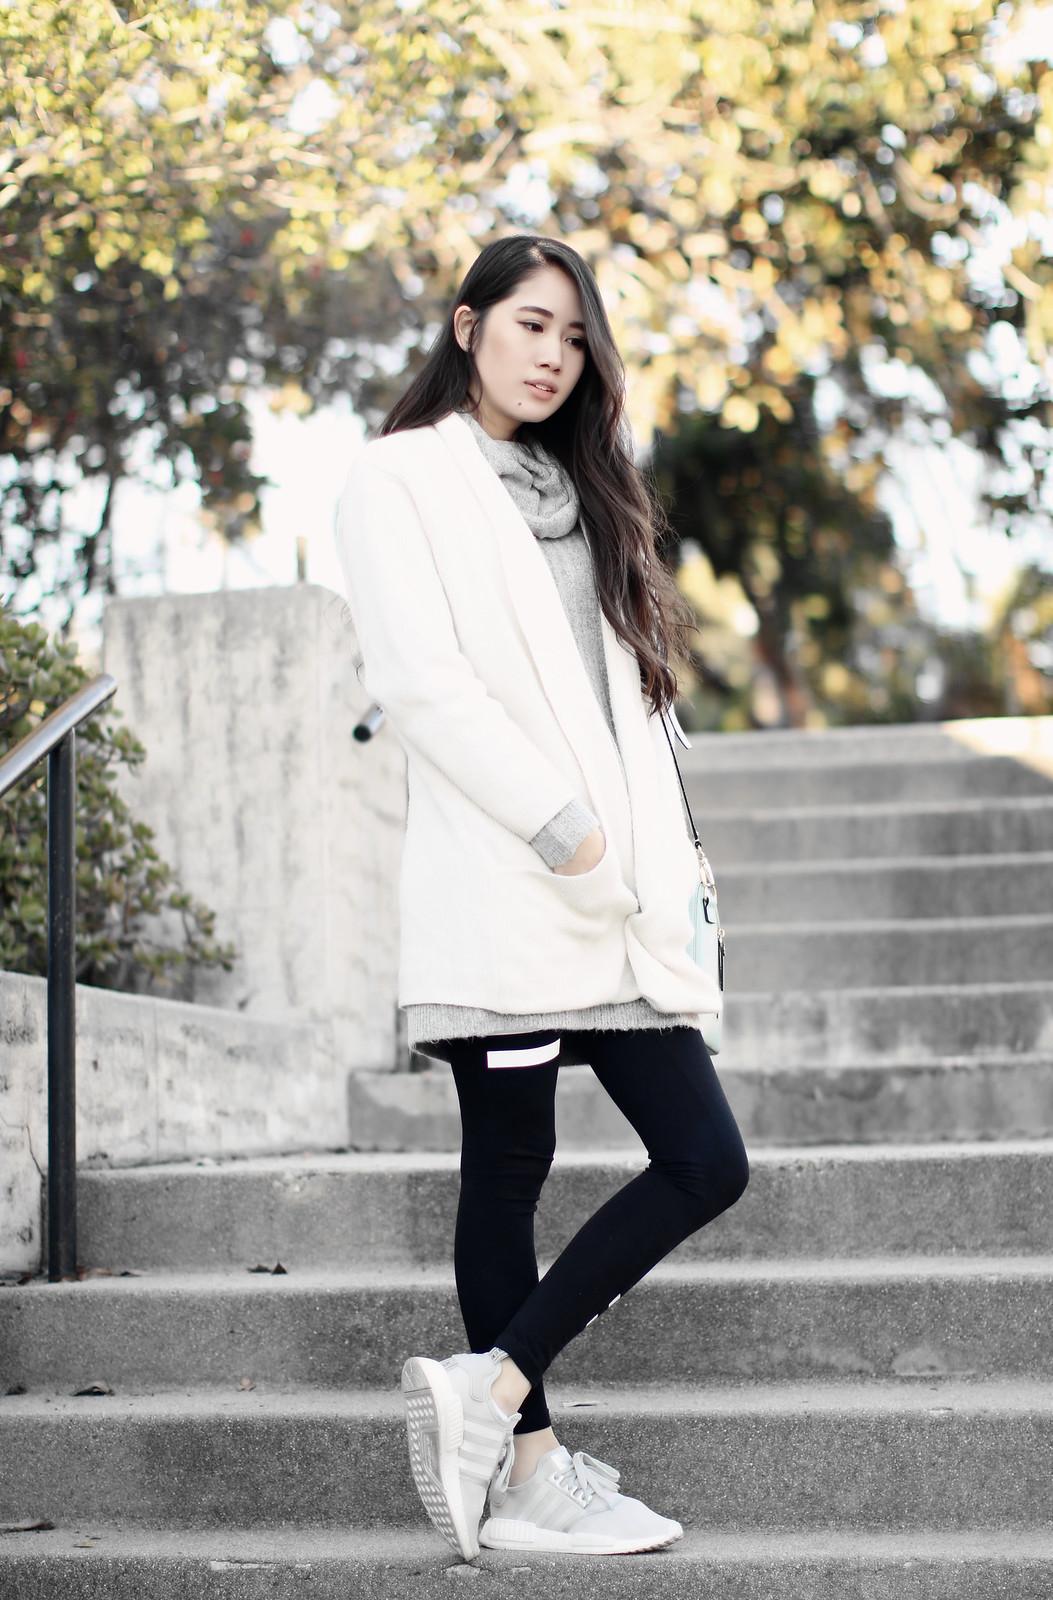 1533-ootd-fashion-style-tobi-cowl-neck-turtleneck-sweater-dress-asianfashion-koreanfashion-winterfashion-clothestoyouuu-elizabeeetht